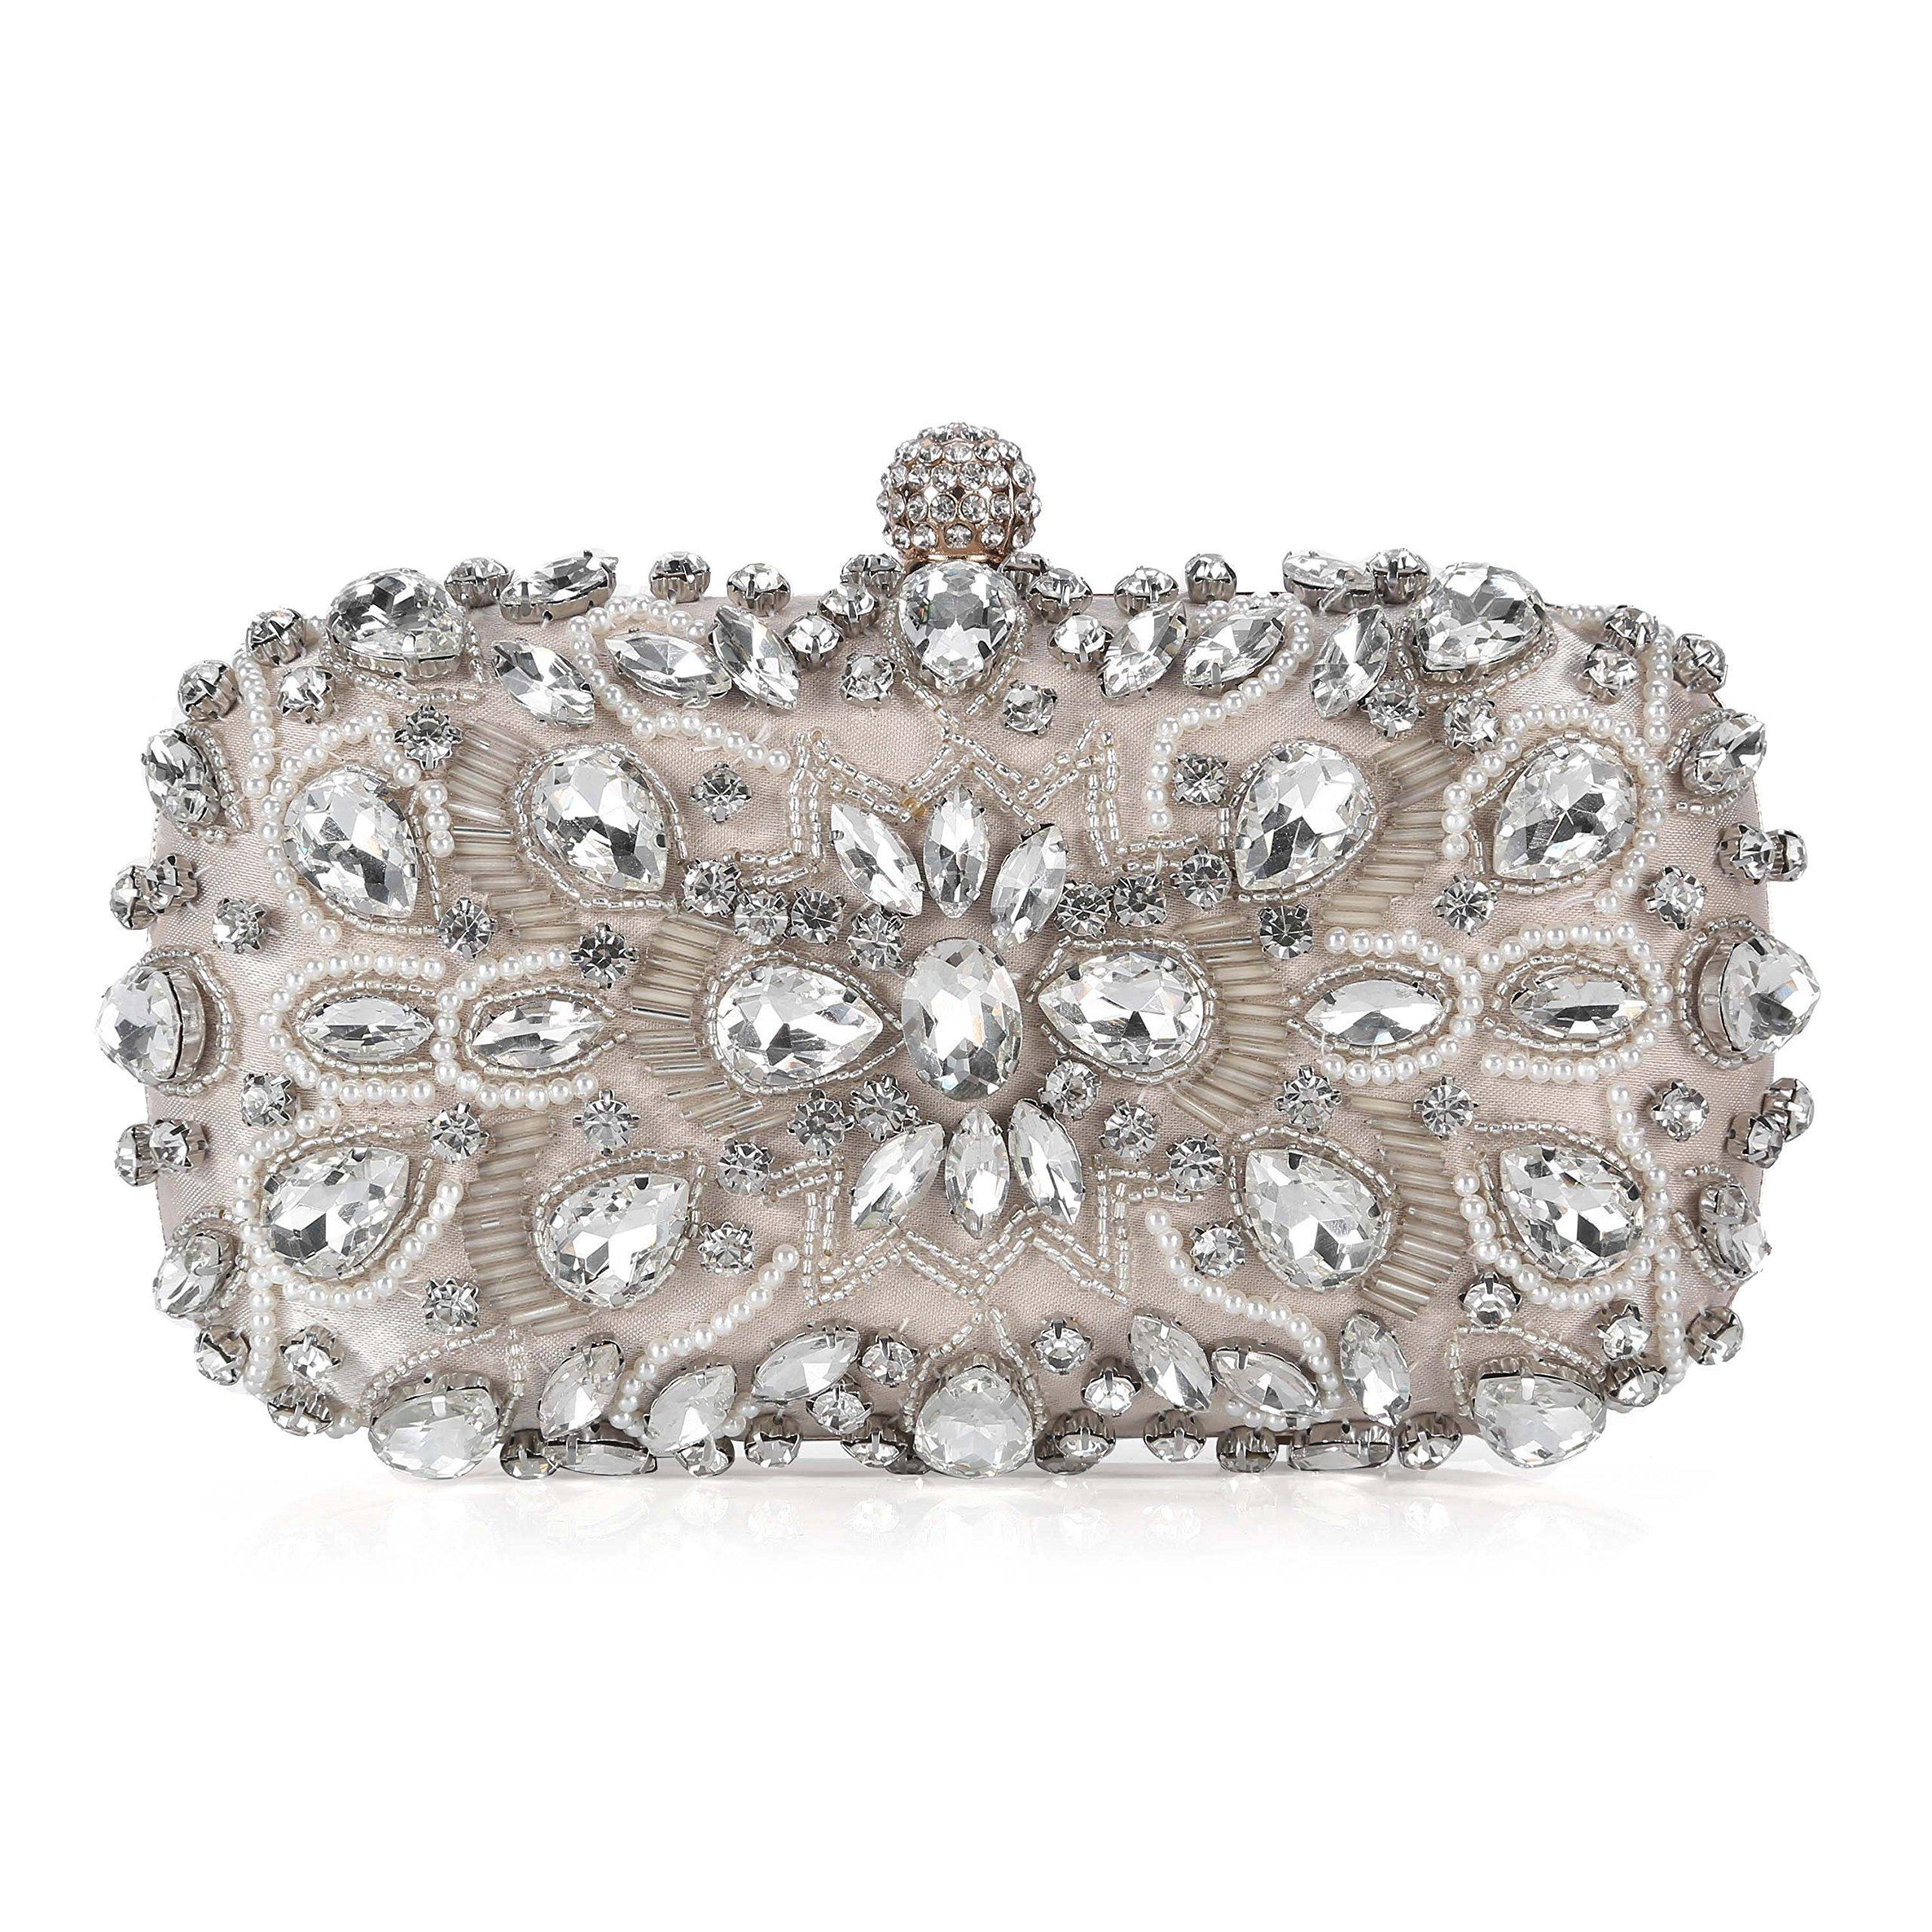 Chichitop Women Crystal Beaded Rhinestone Evening Clutch Bag Wedding Purse Bridal Prom Handbag Party Bag (Apricot)